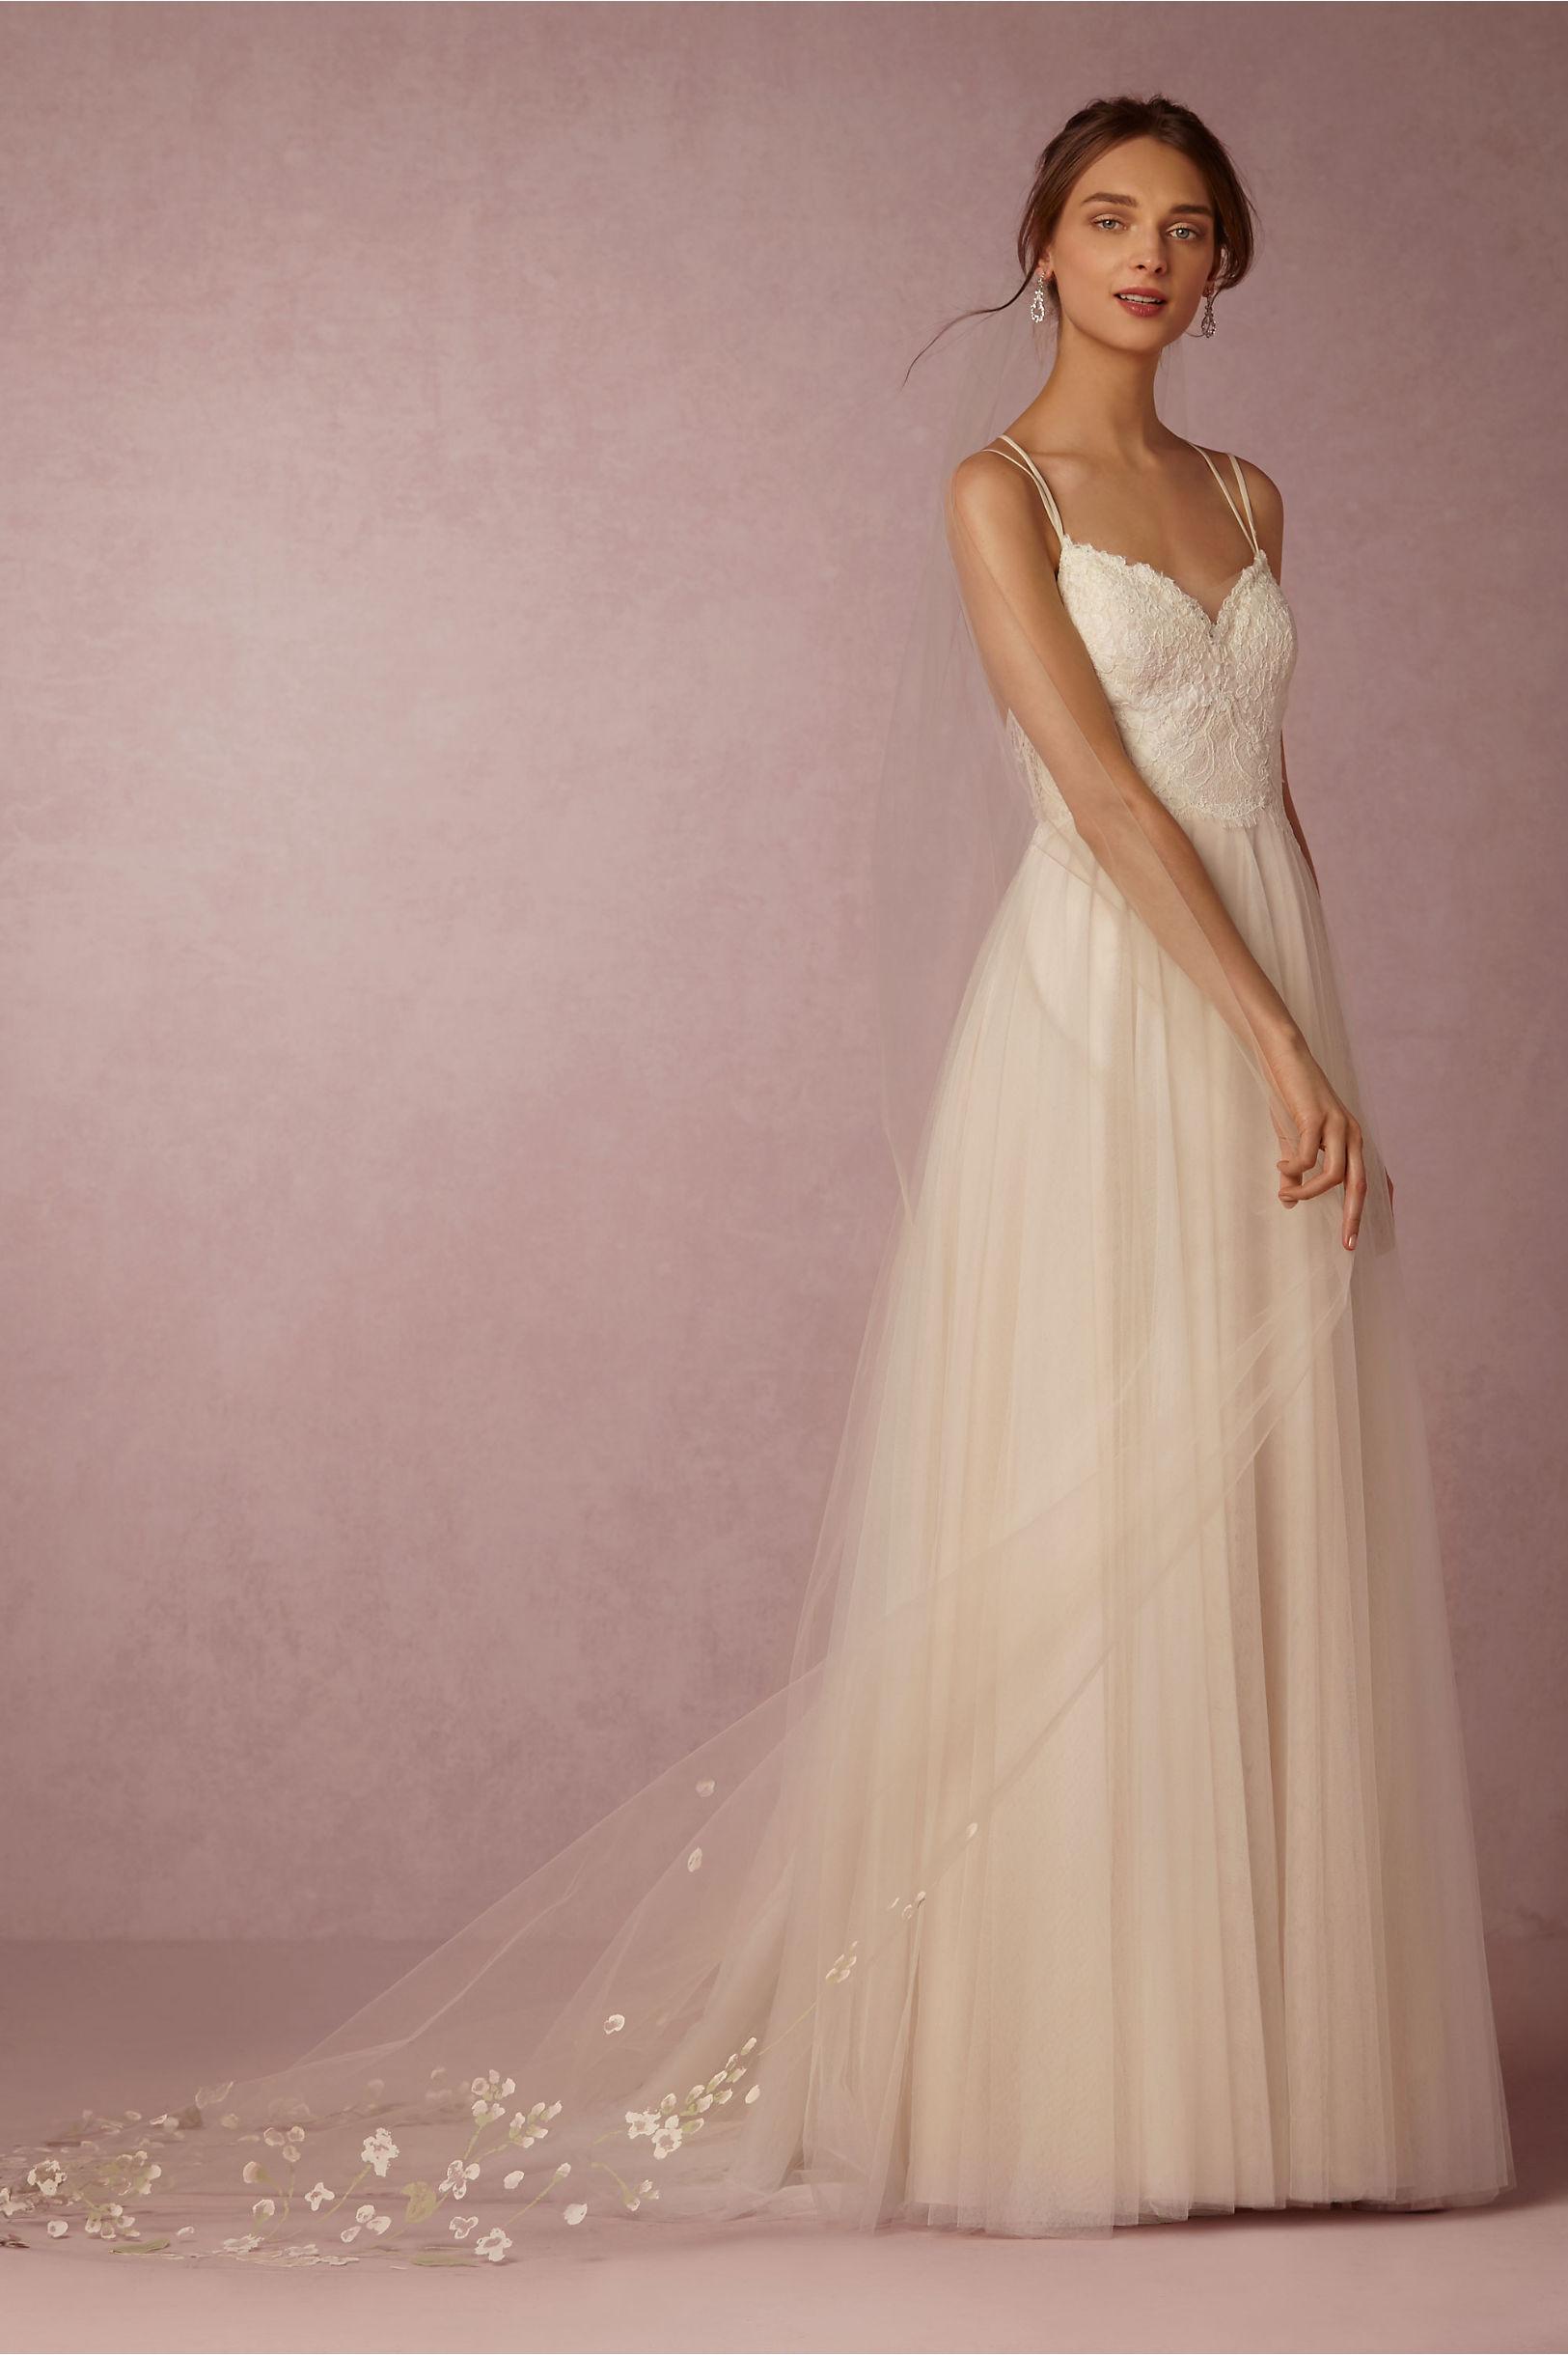 Painted Flora Veil Blush in Bride | BHLDN